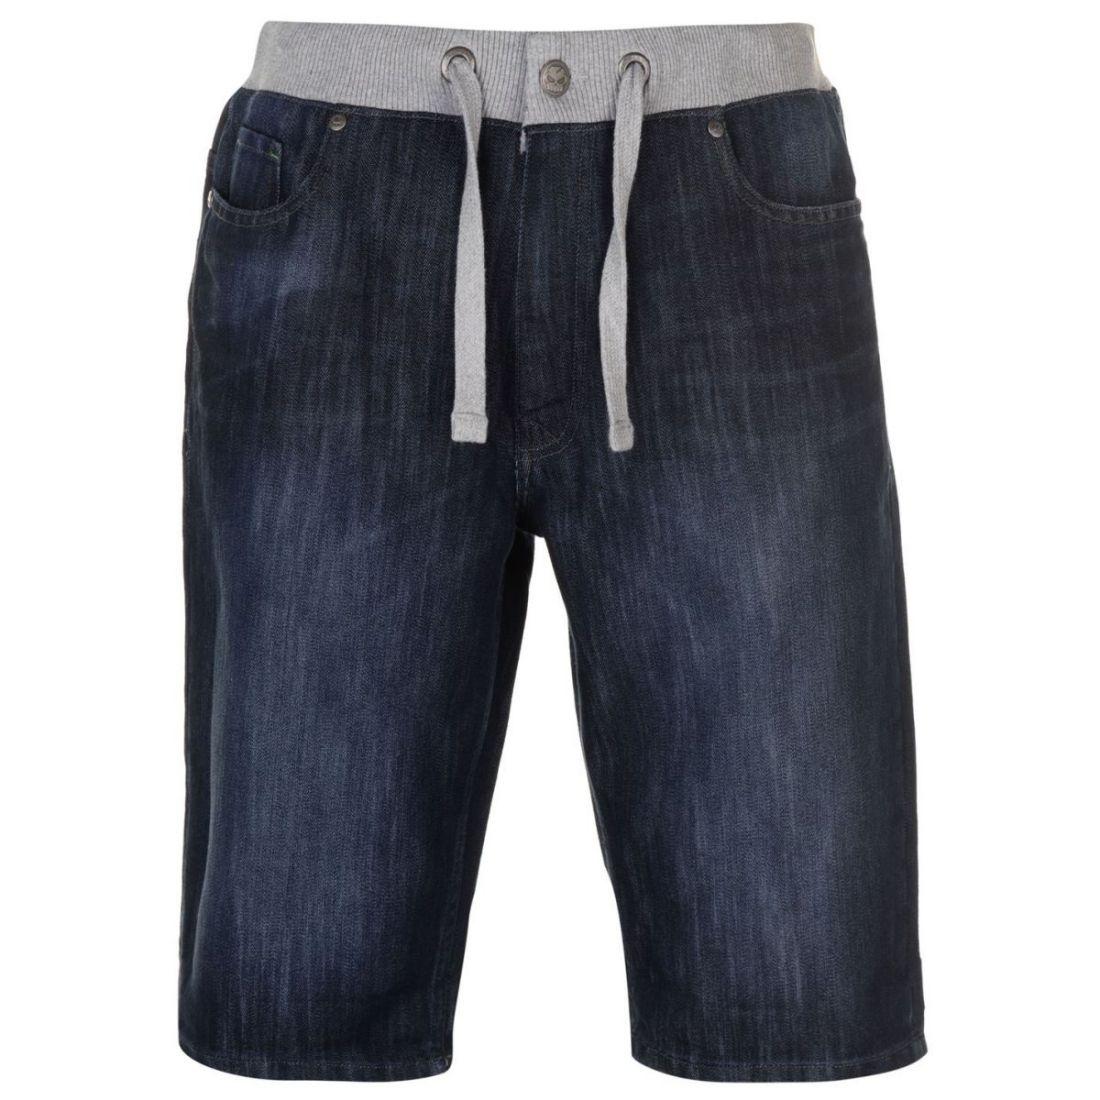 No-Fear-Mens-Denim-Shorts-Pants-Trousers-Bottoms-Zip-Warm-Drawstring-Elasticated thumbnail 3